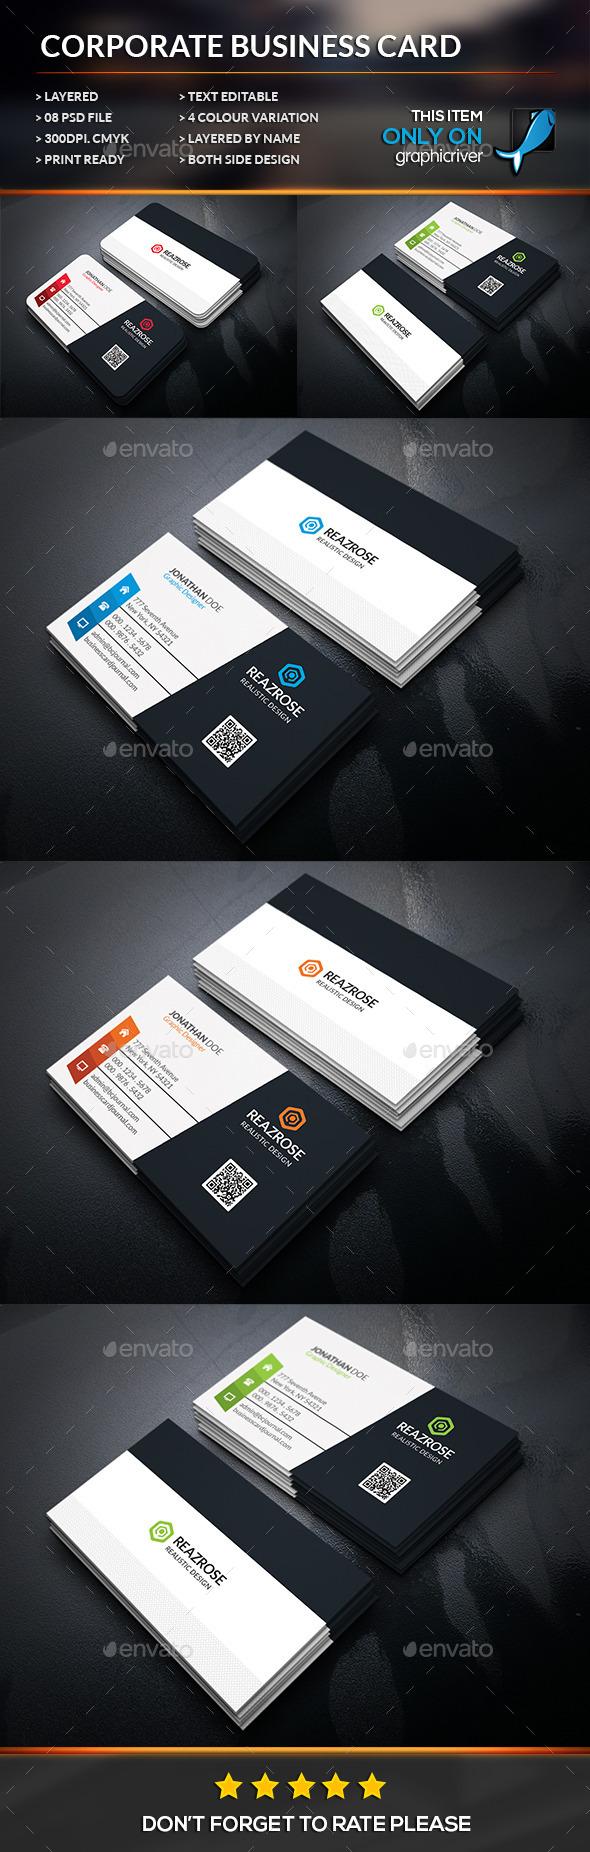 Modern corporate business card business card template psd modern corporate business card business card template psd download here http reheart Images